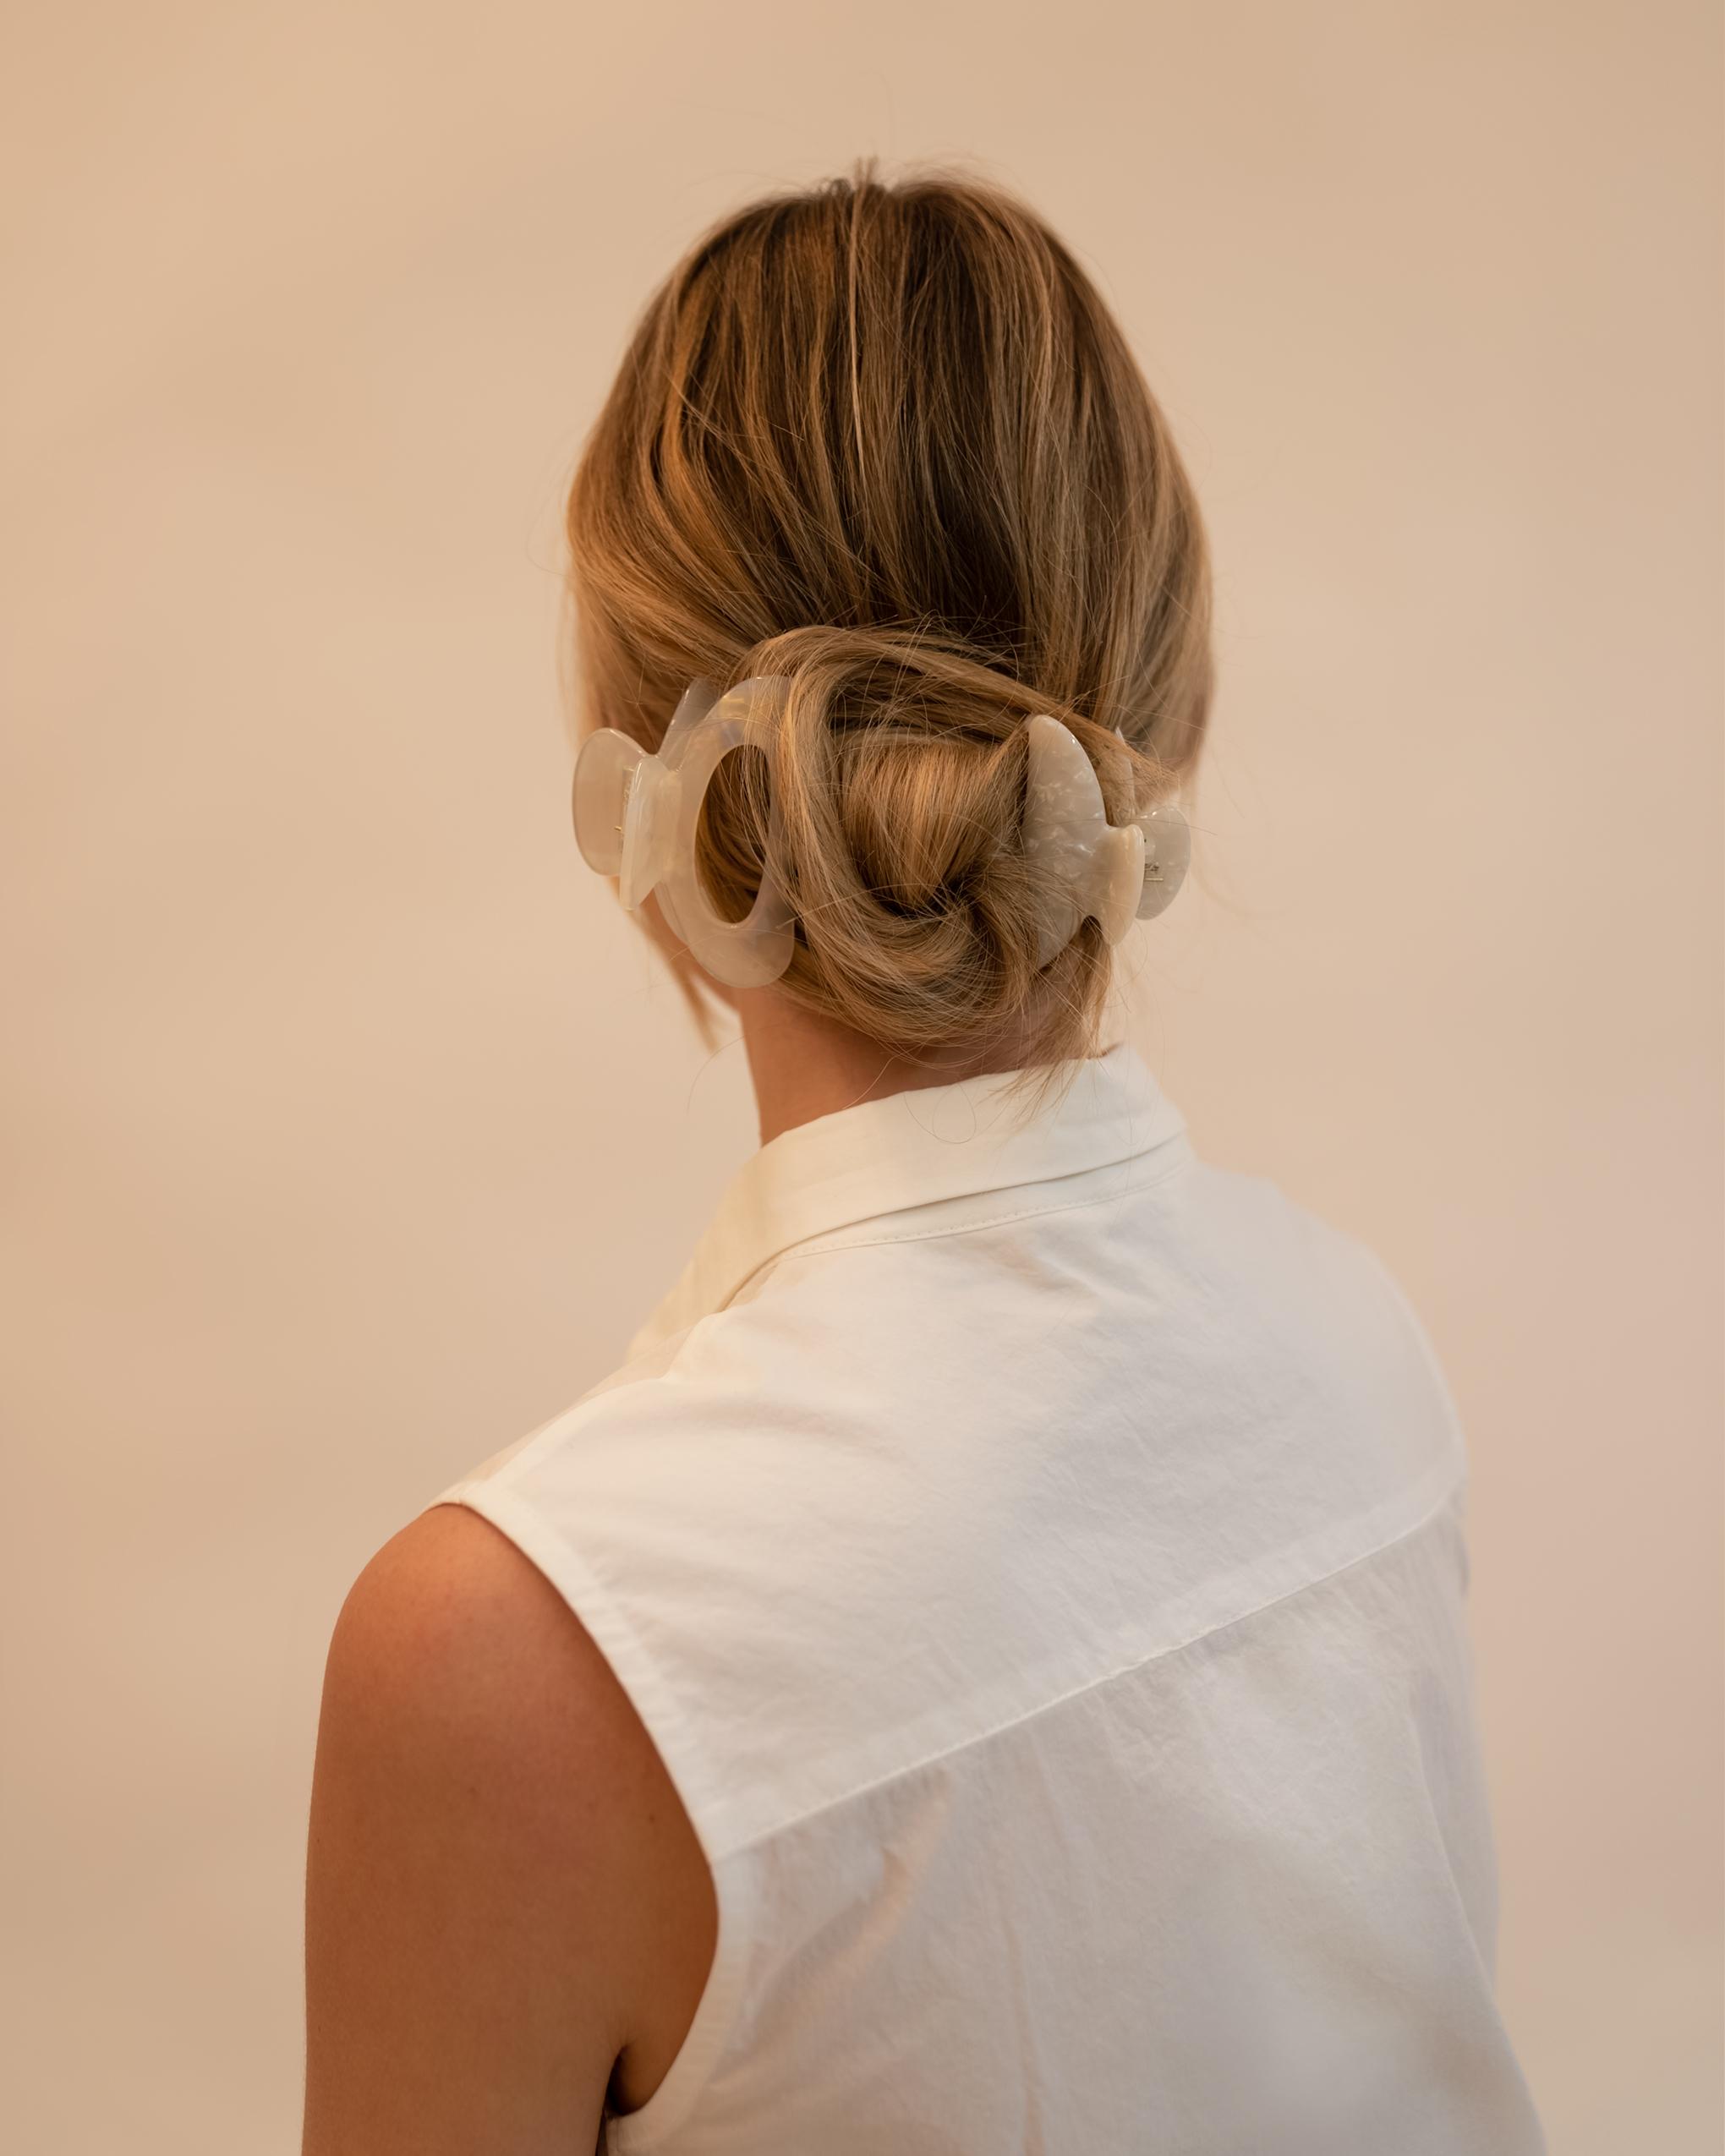 Model wearing Emin + Paul white opal cut out hair claw.